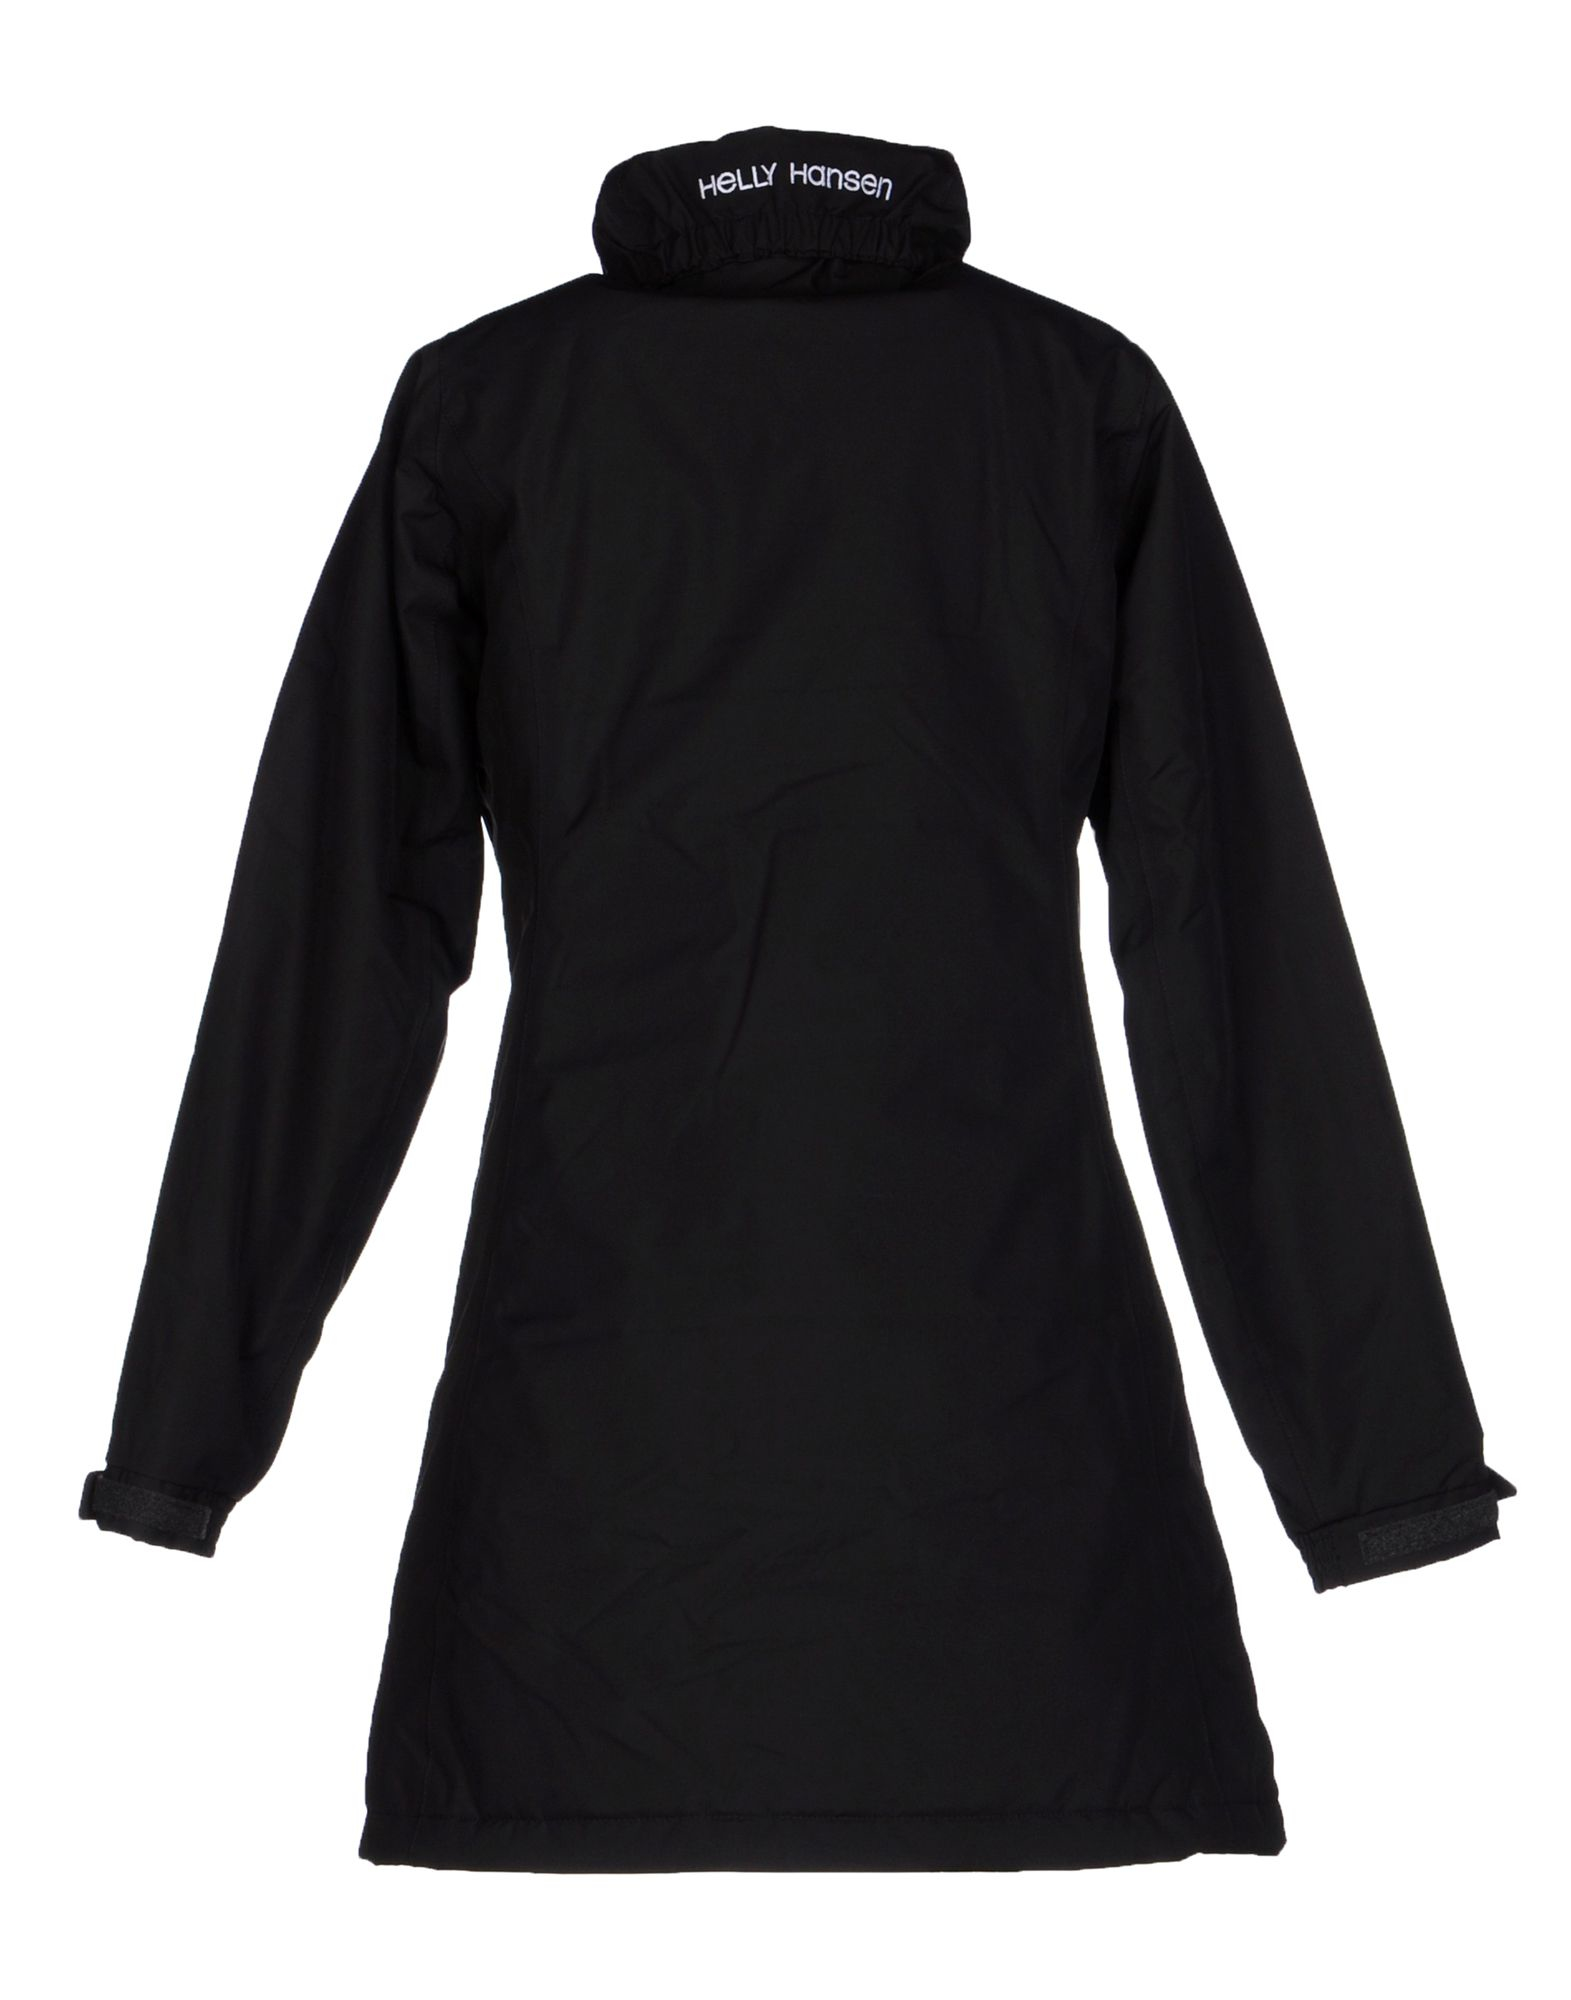 black single women in hansen Regatta outlet - women's jackets & coats up to 75% off rrp  adelma long length wind resistant hooded softshell jacket black rrp.